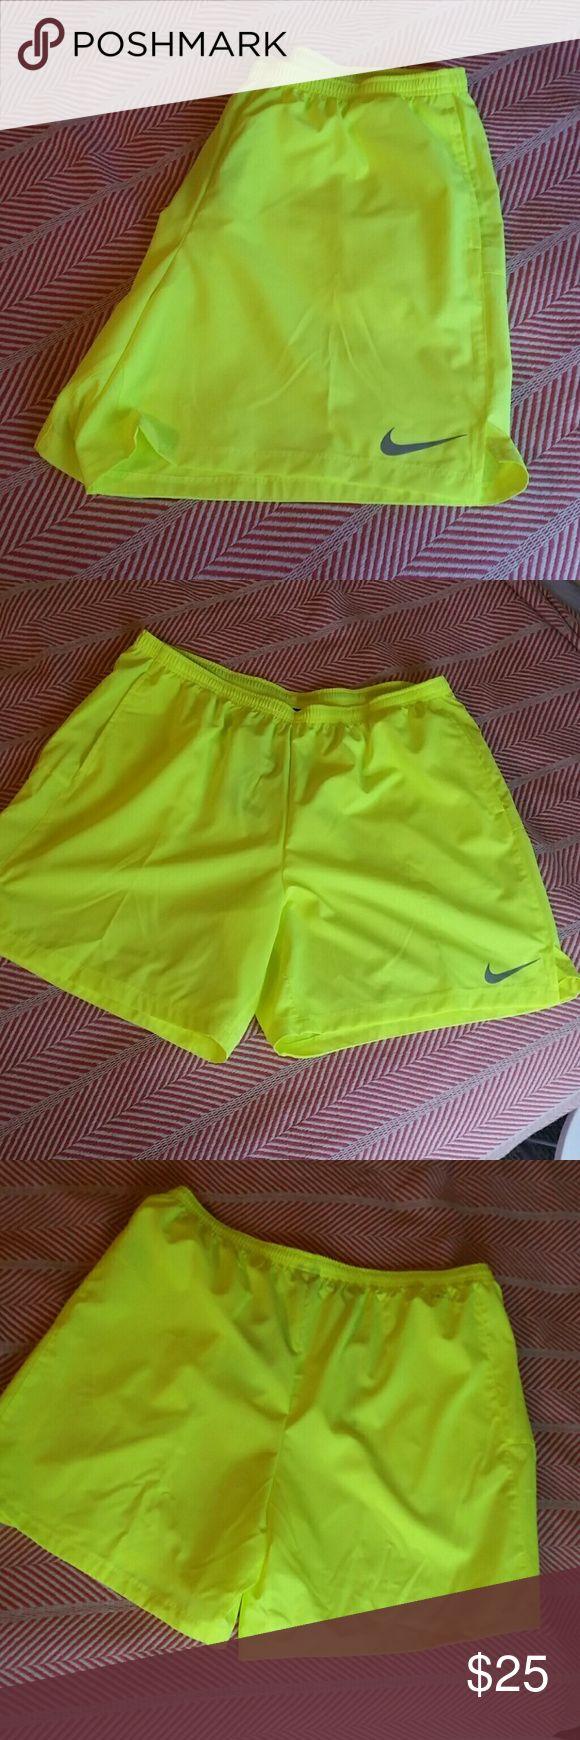 Men's Nike Dri-Fit Flex Neon Yellow Shorts Highlighter/neon yellow color. Drawstring waist, pockets, mesh side detailing. Lightweight. Reflective Nike swoosh. Nike Shorts Athletic